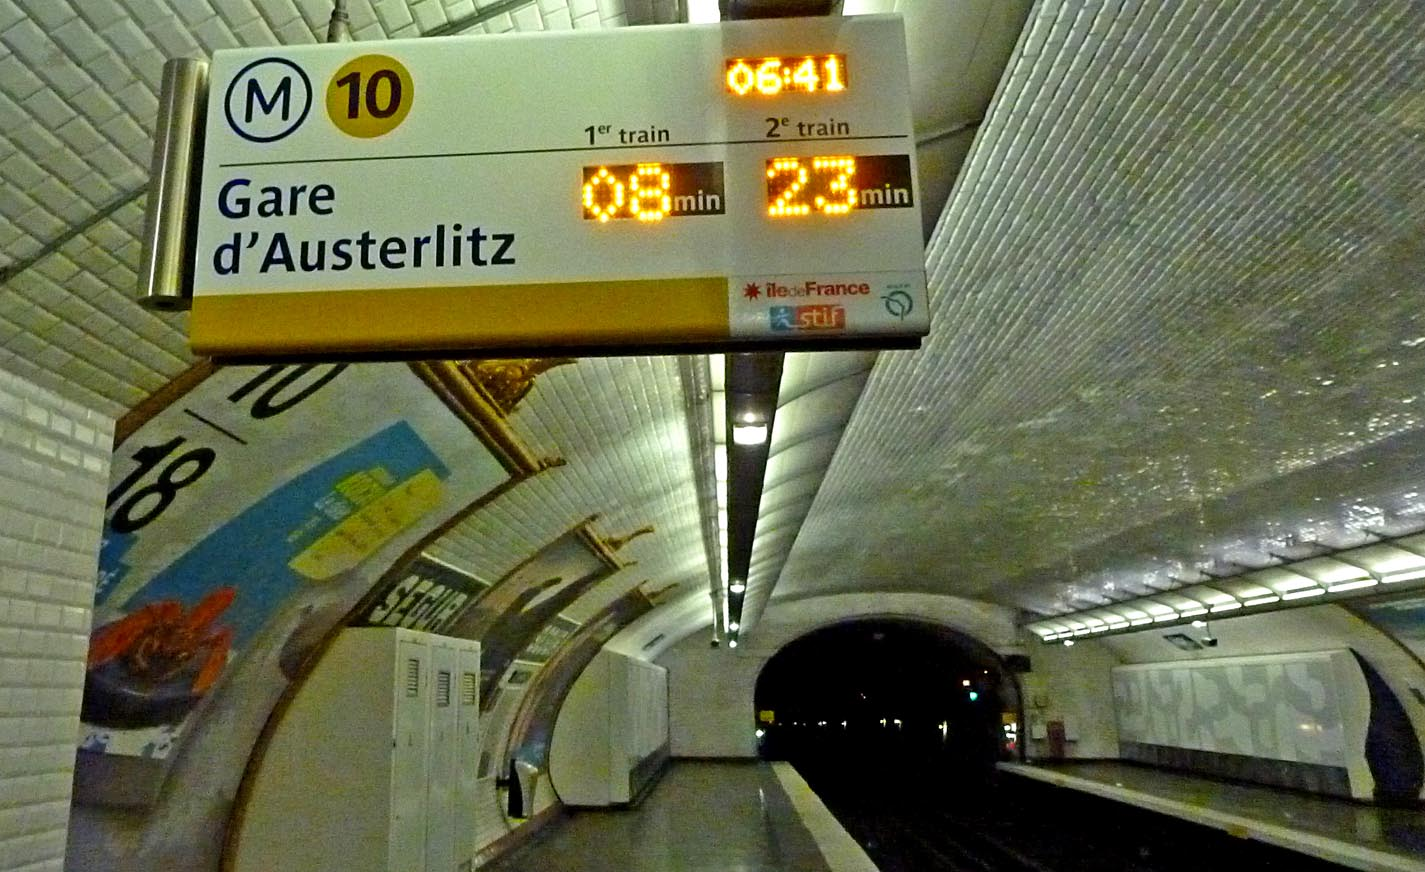 метро парижа схема станция аустерлиц